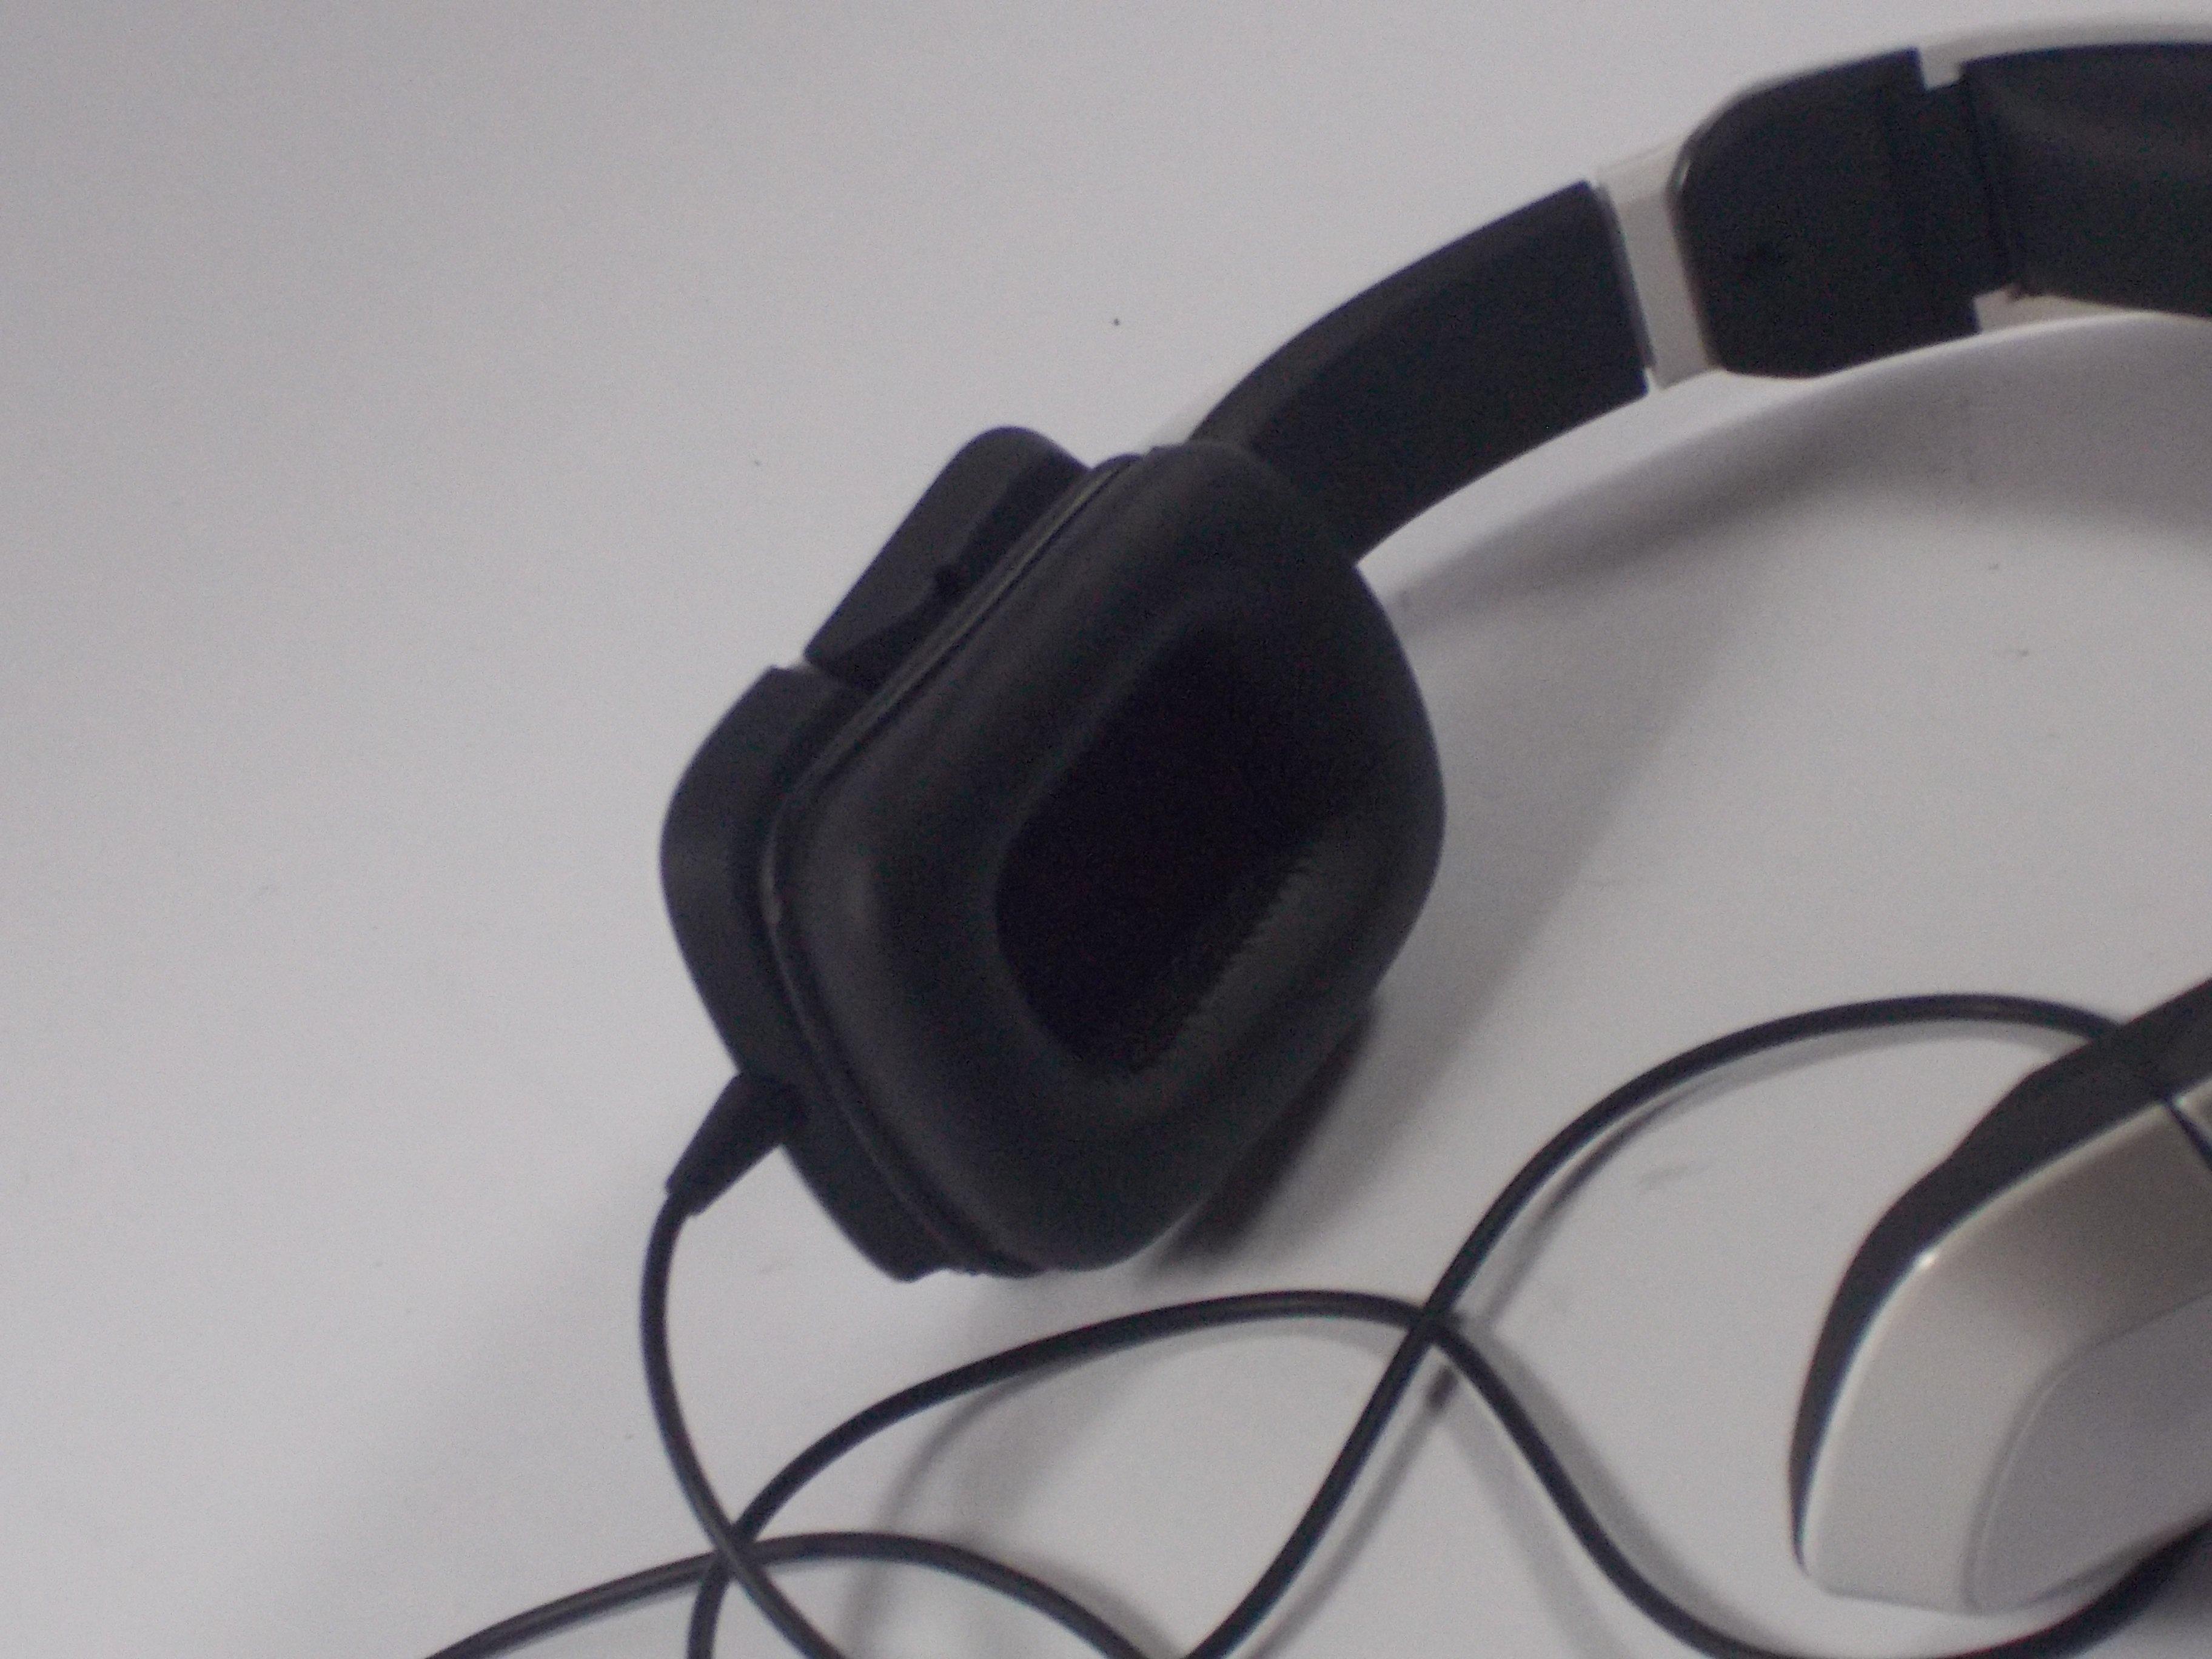 Repairing Tritton Kunai Speaker Buzzing Noise - iFixit Repair Guide